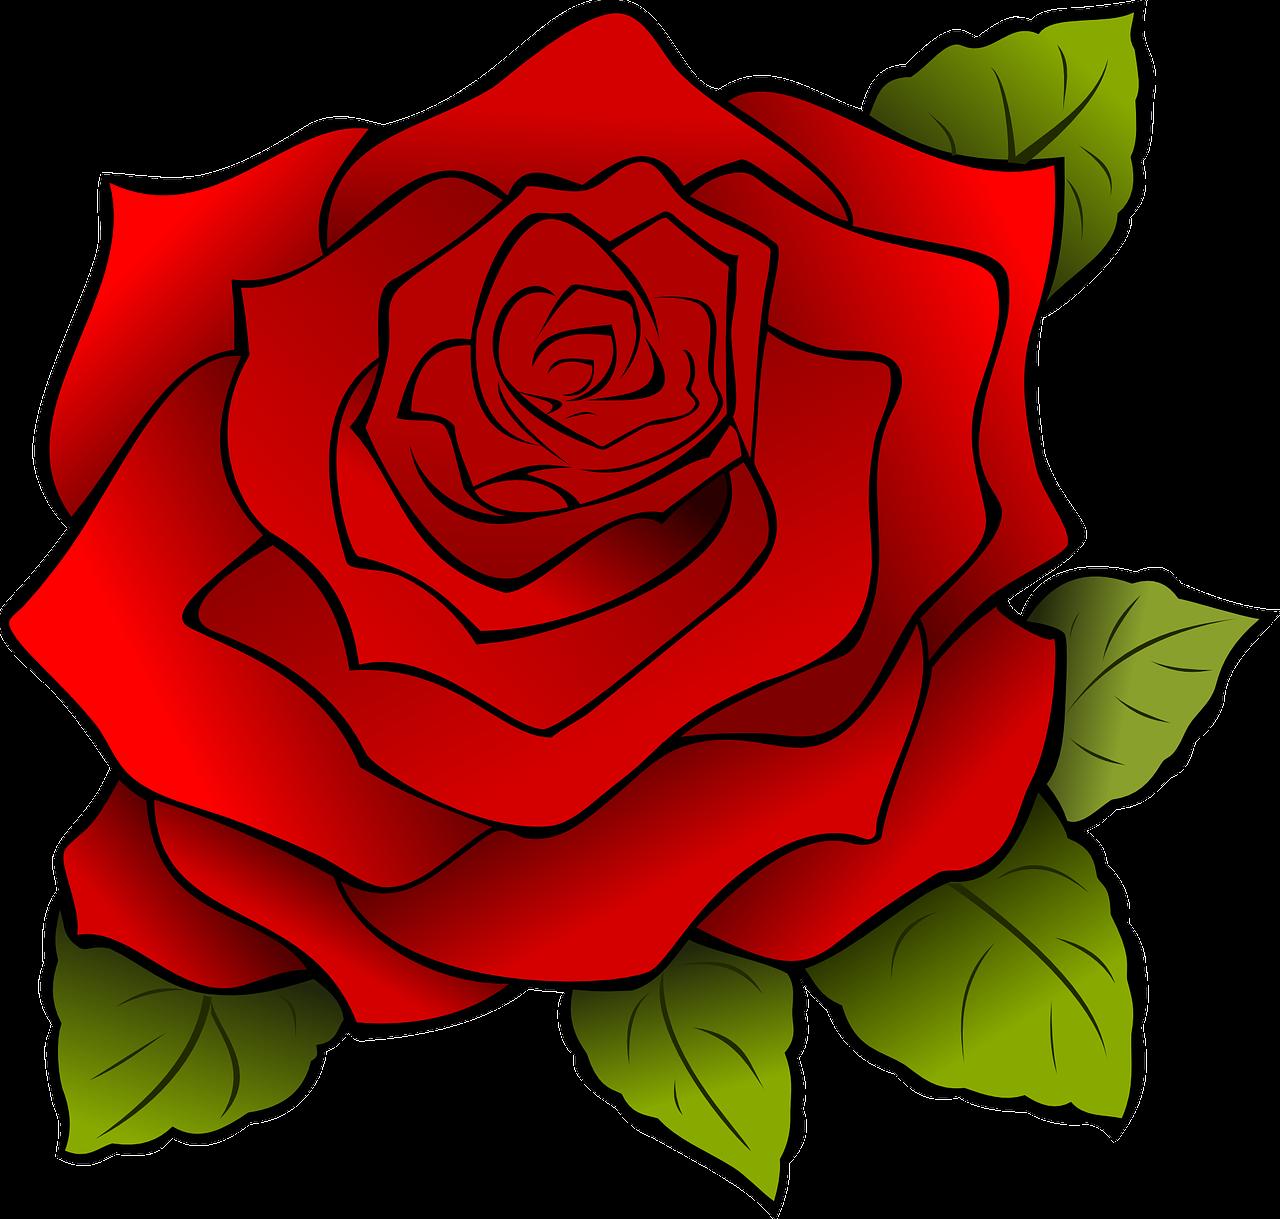 Clipart kuvat: Clipart ruusu